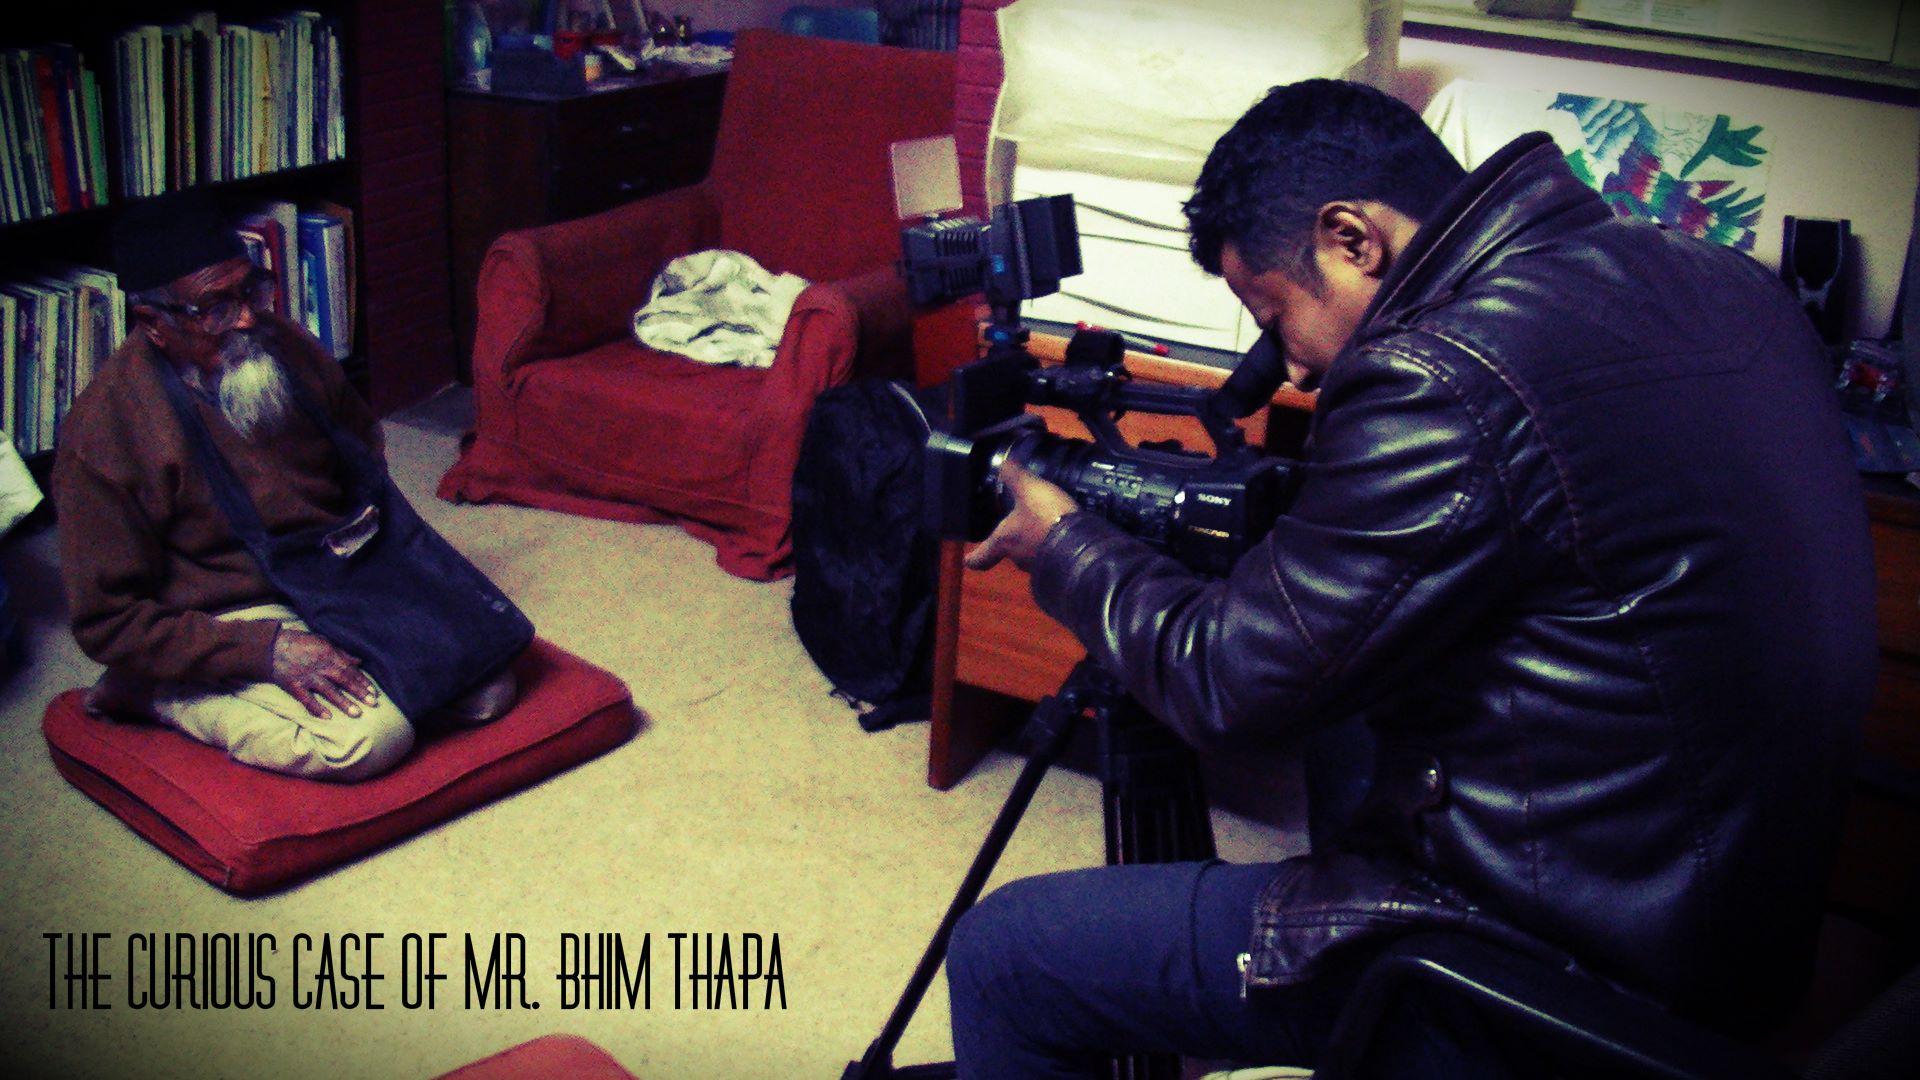 The Curious Case Of Mr. Bhim Thapa Trailer - thecinematimes.com